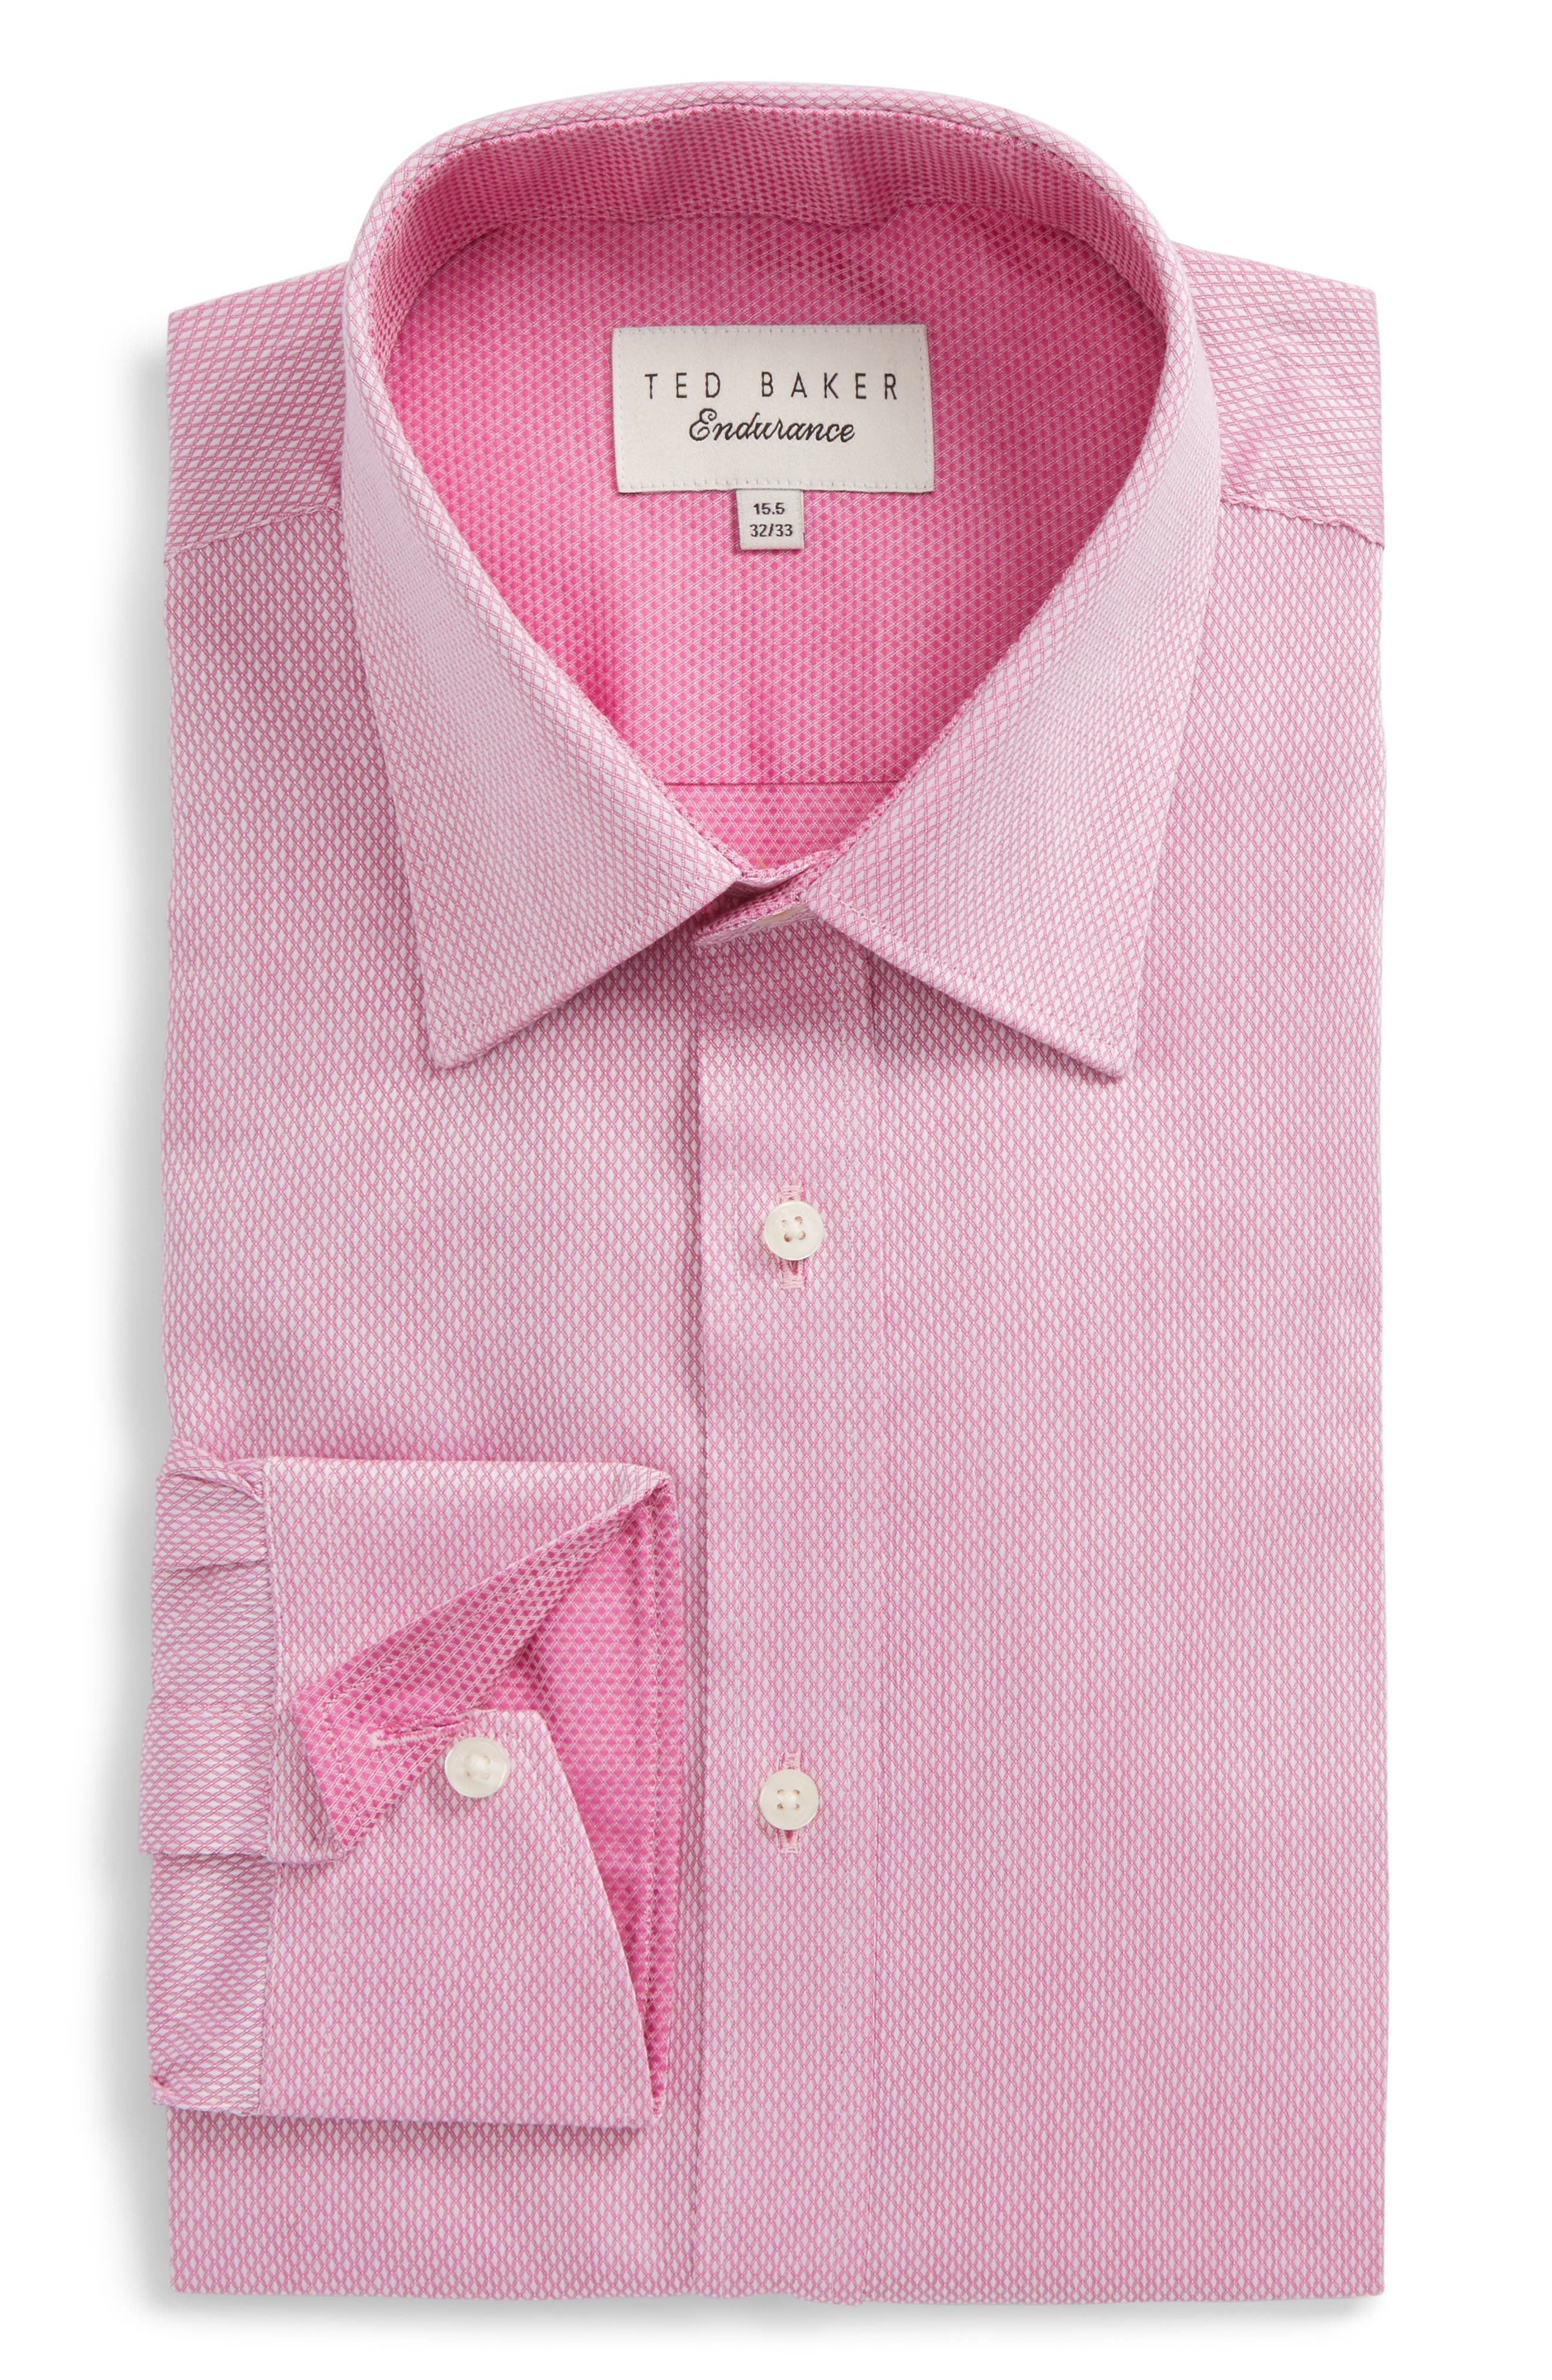 Lavindr Endurance Trim Fit Solid Dress Shirt,                         Main,                         color, Pink